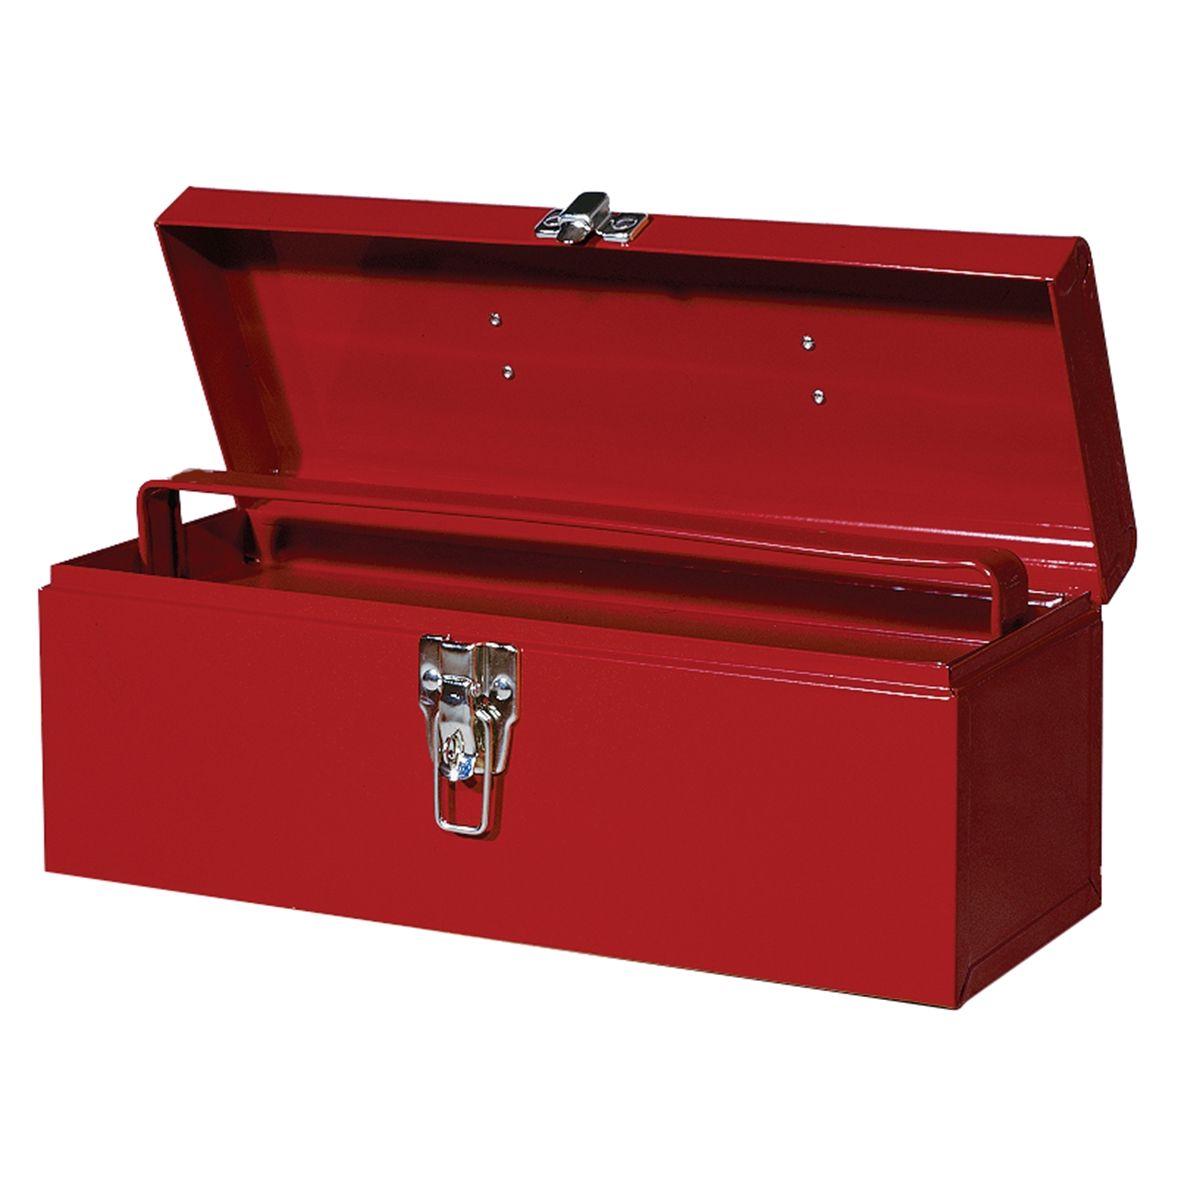 International Tool Boxes B528 19 Metal Hand Tool Box Itbb528. Adjustable Height Desk. Exercises To Do At The Desk. Drop Leaf Bar Table. Used School Desks. Dental Office Hiring Front Desk. Double Drawer Dishwasher. End Table Size. Ikea Hacks Desk